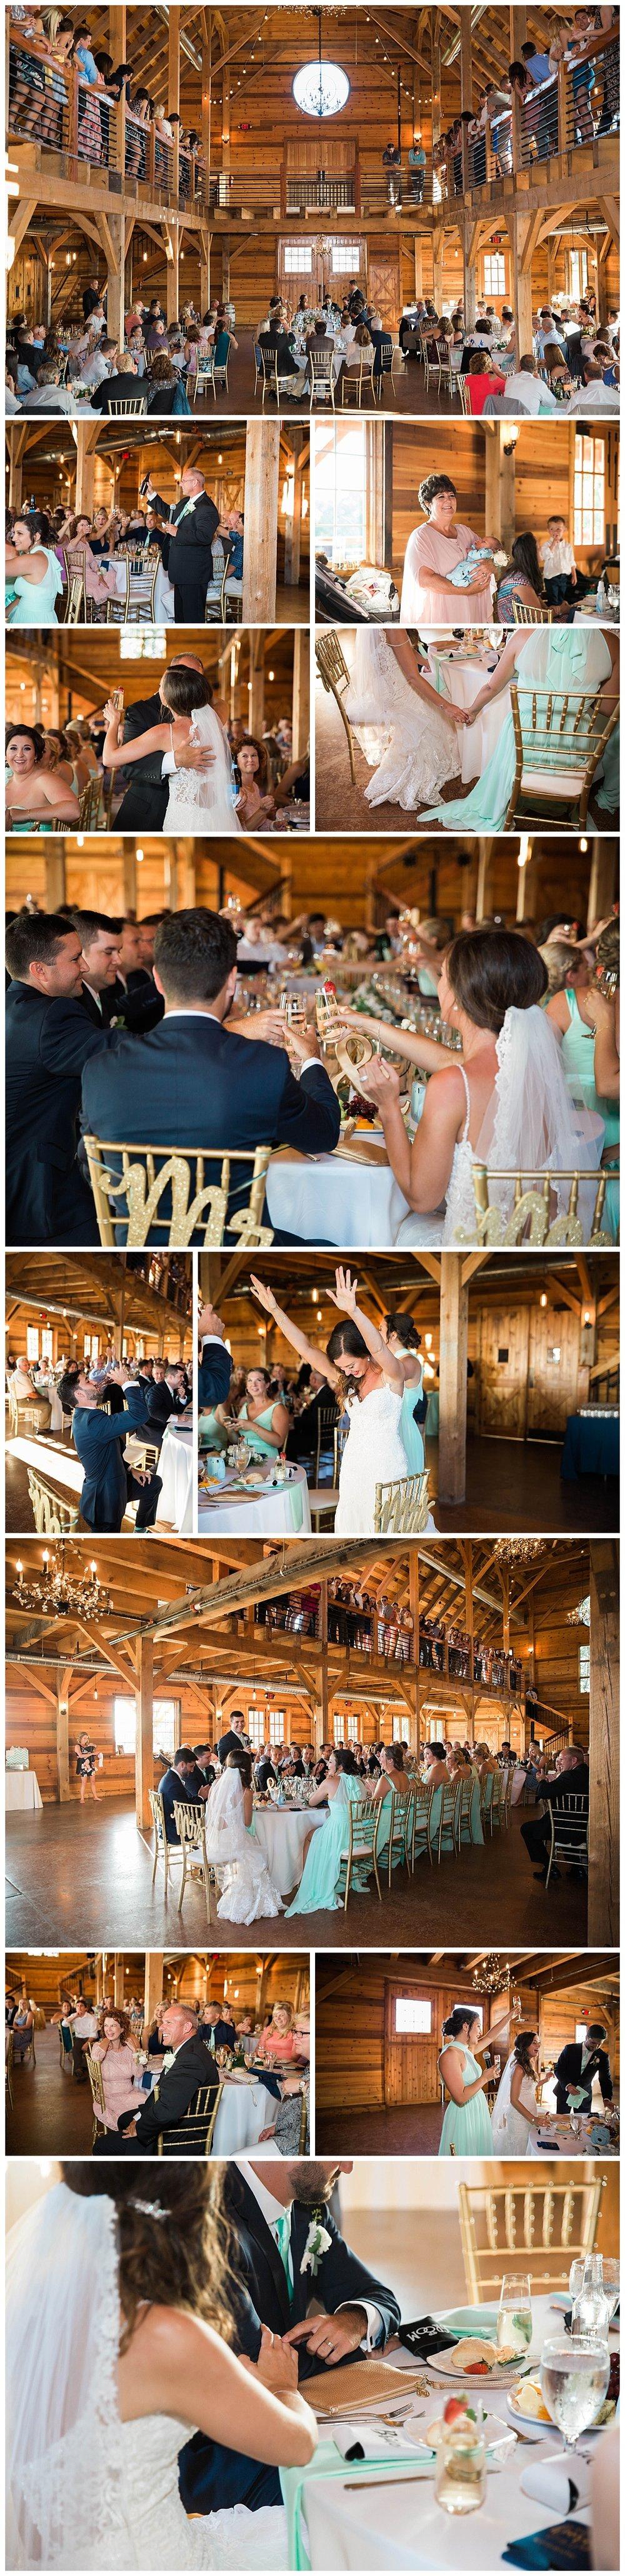 Cleveland-Wedding-Photographer_0070.jpg